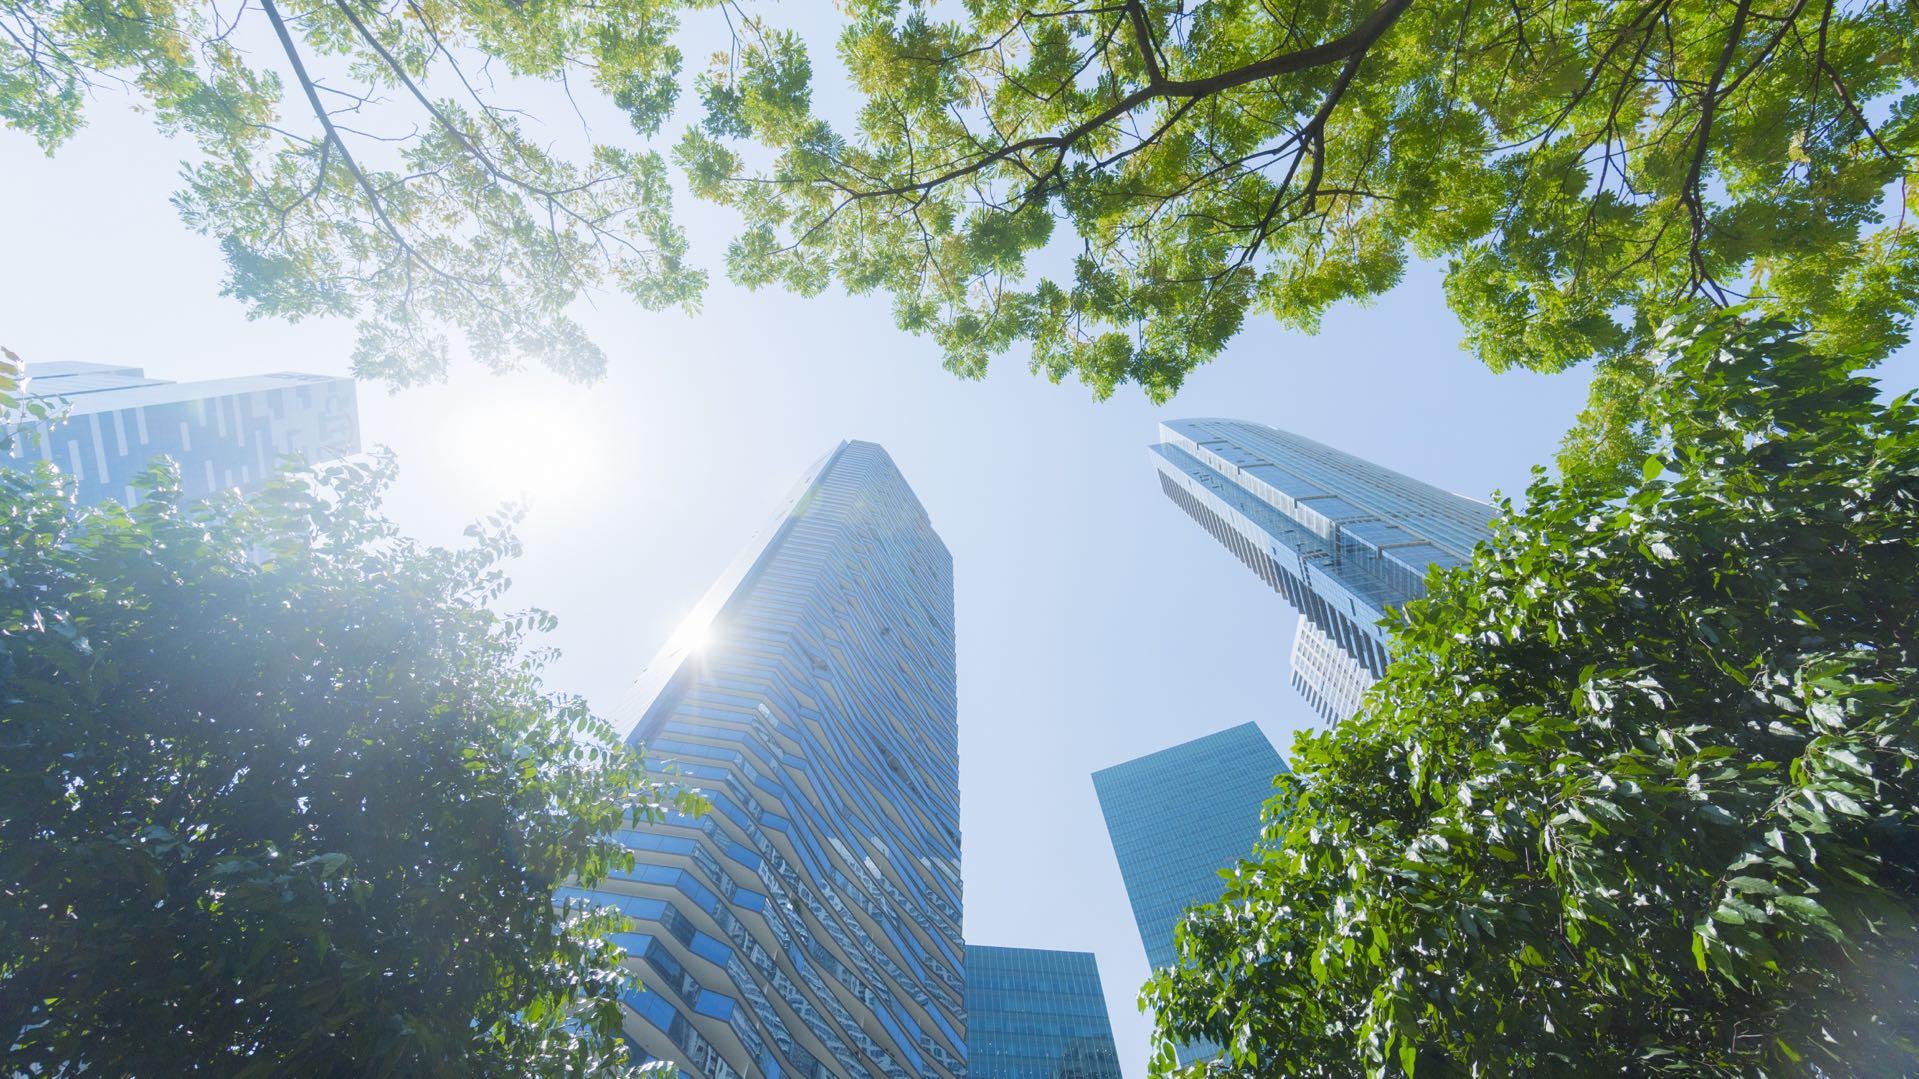 ABB被评为全球最佳可持续发展企业之一